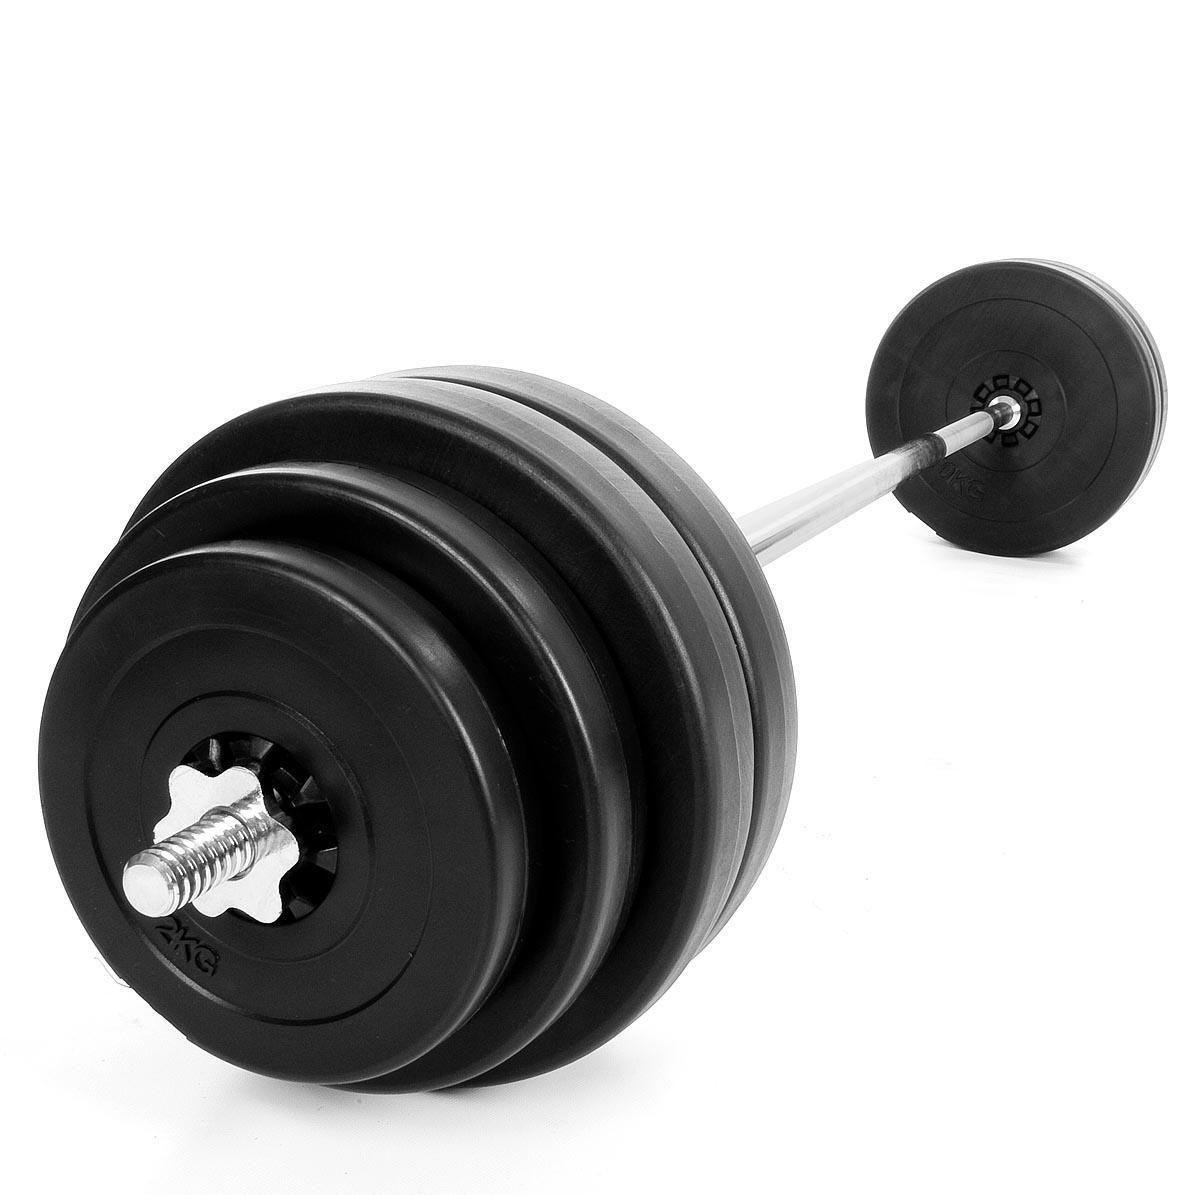 Langhantel-Set-30-60kg-oder-30kg-SZ-Curlstange-Hantel-Langhantelstange-Hanteln